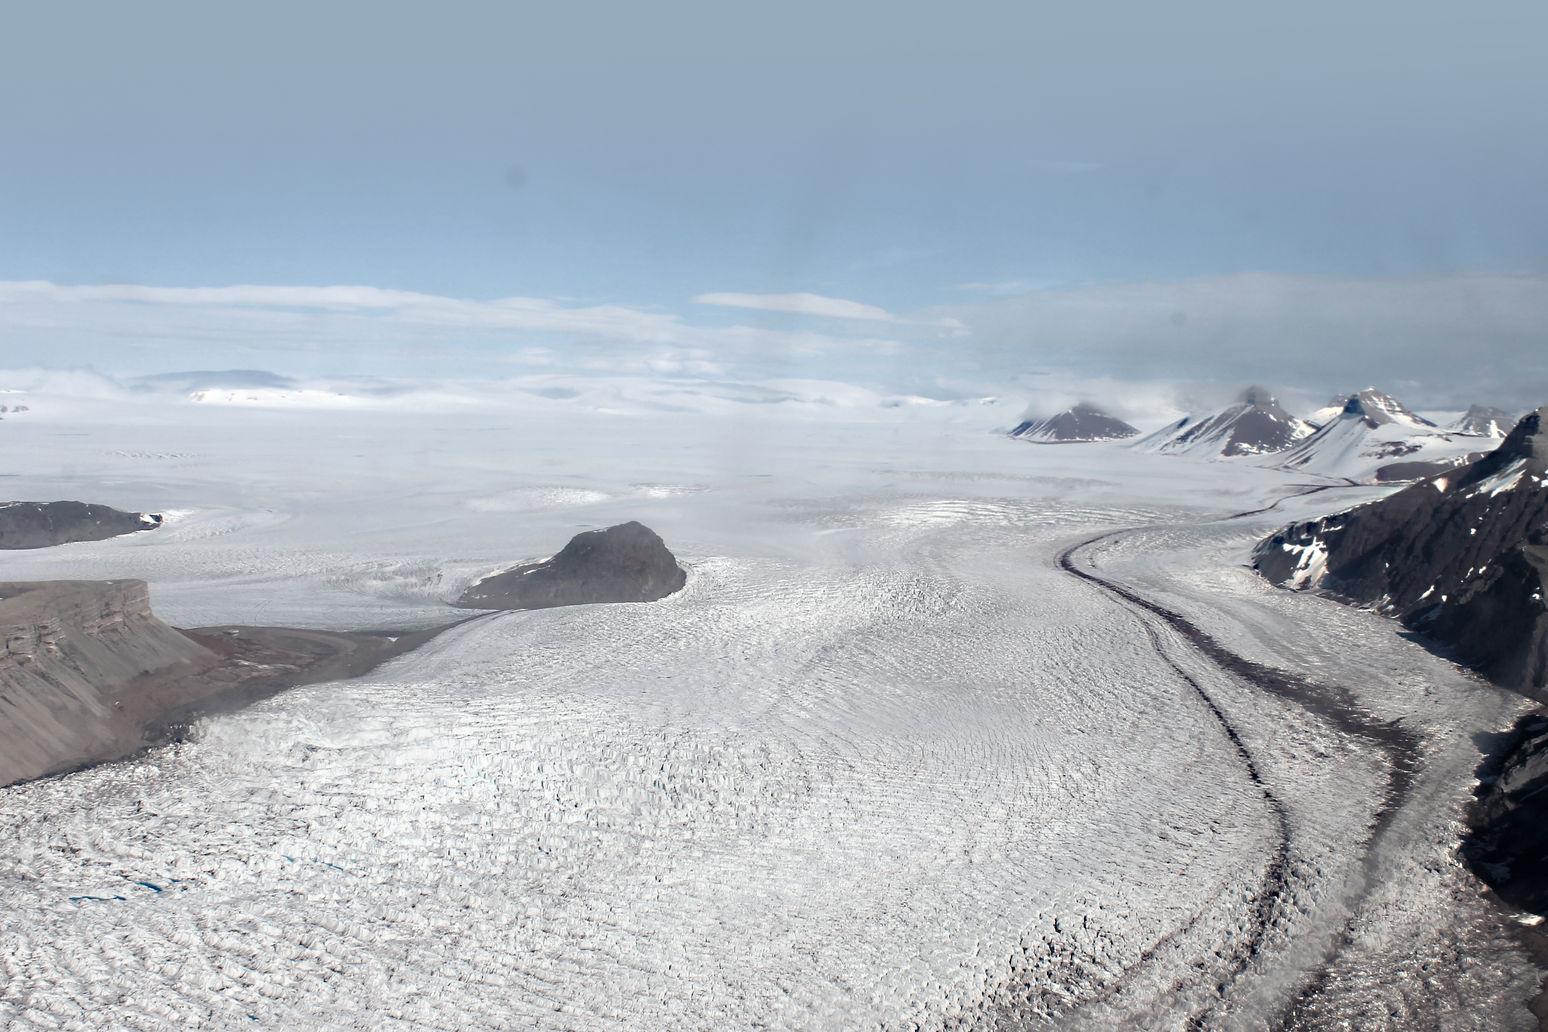 På vei til Ny-Ålesund på Svalbard.